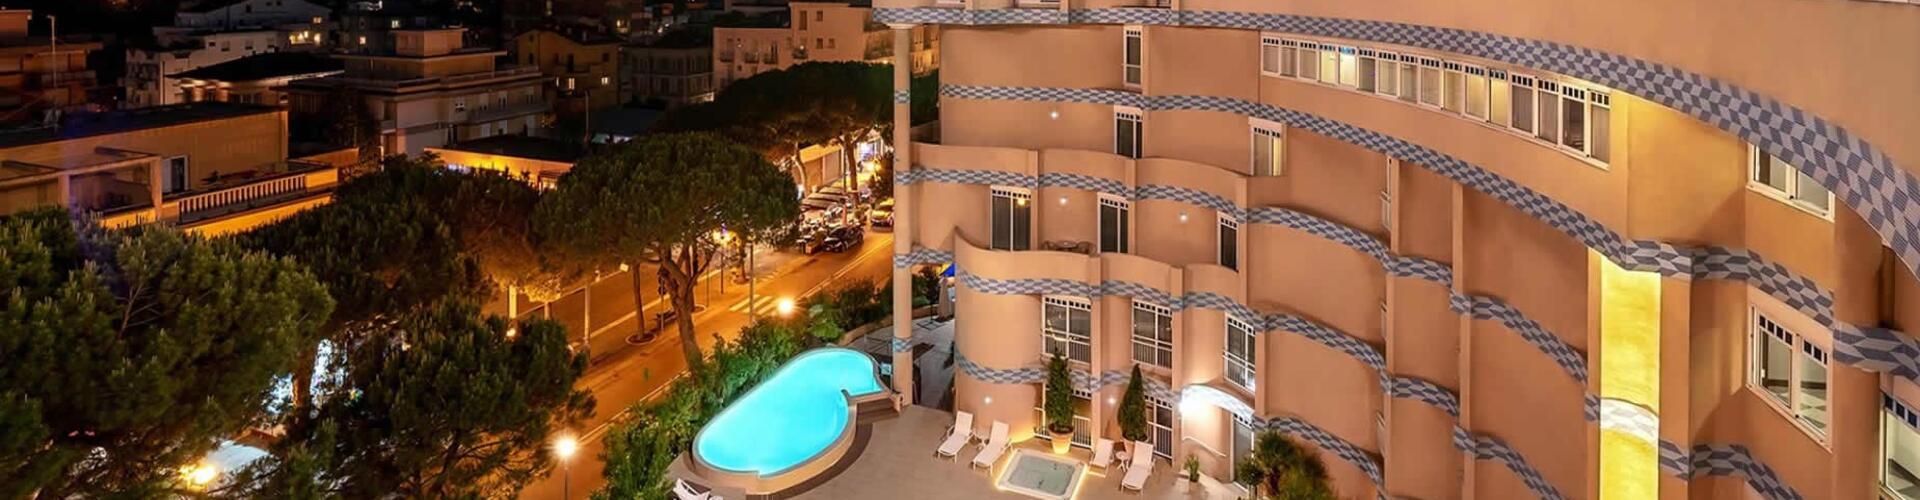 piazzahr it hotels 001